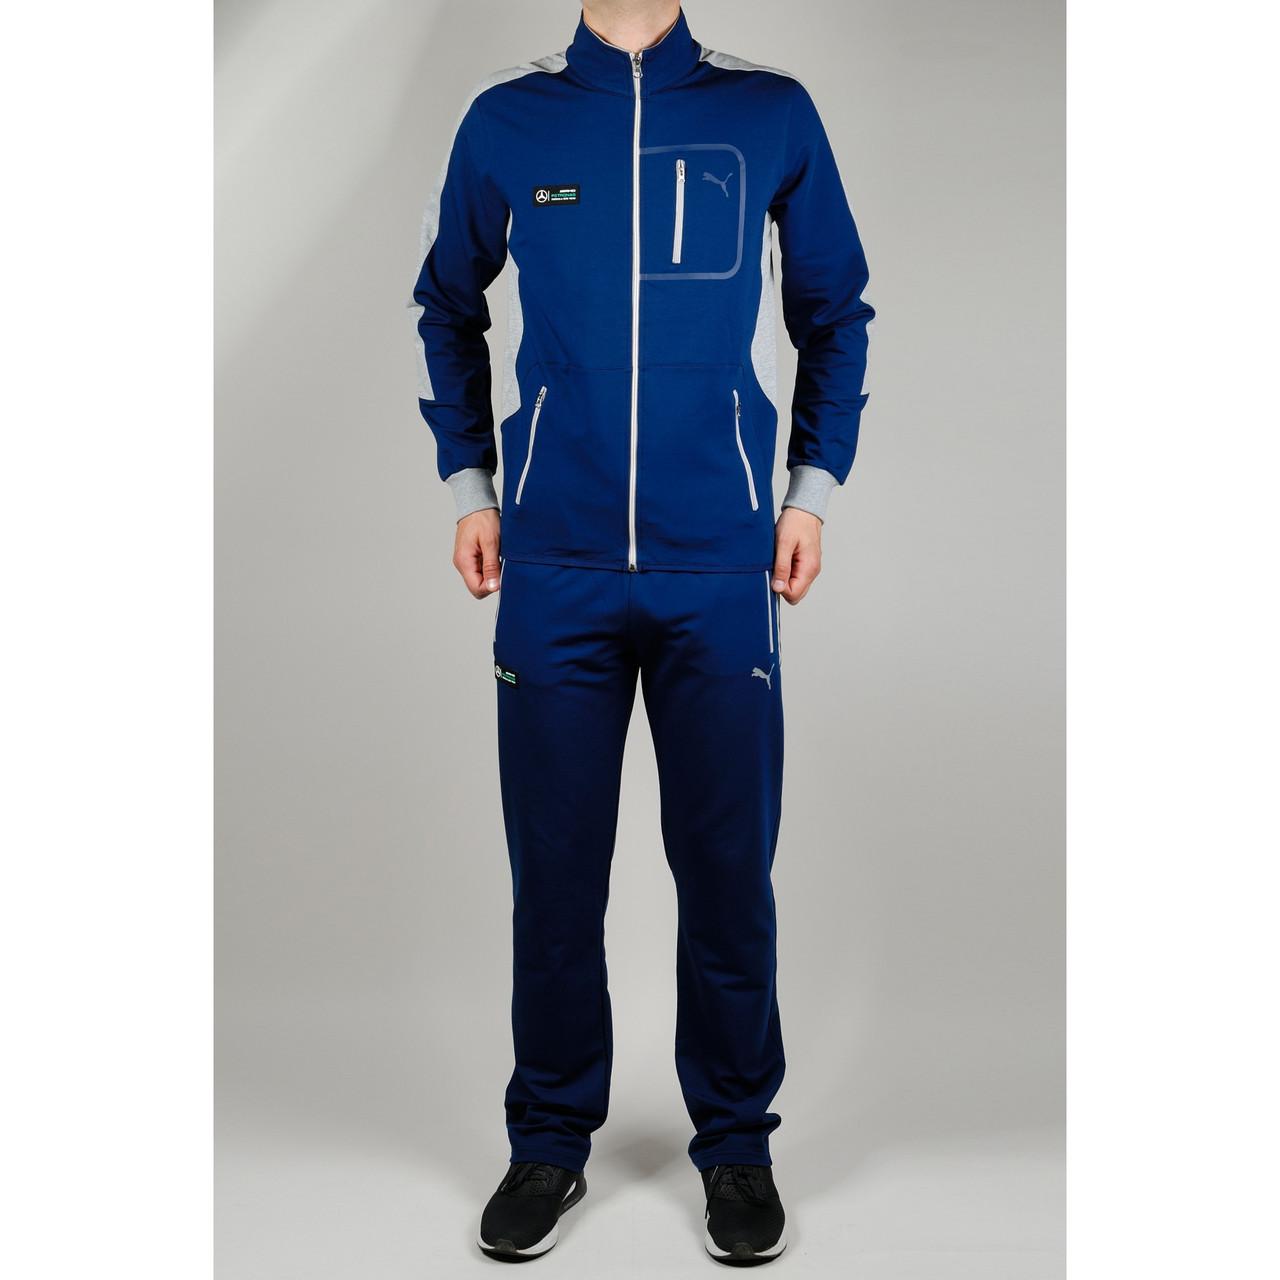 Спортивный костюм PUMA MERCEDES 20959 темно-синий